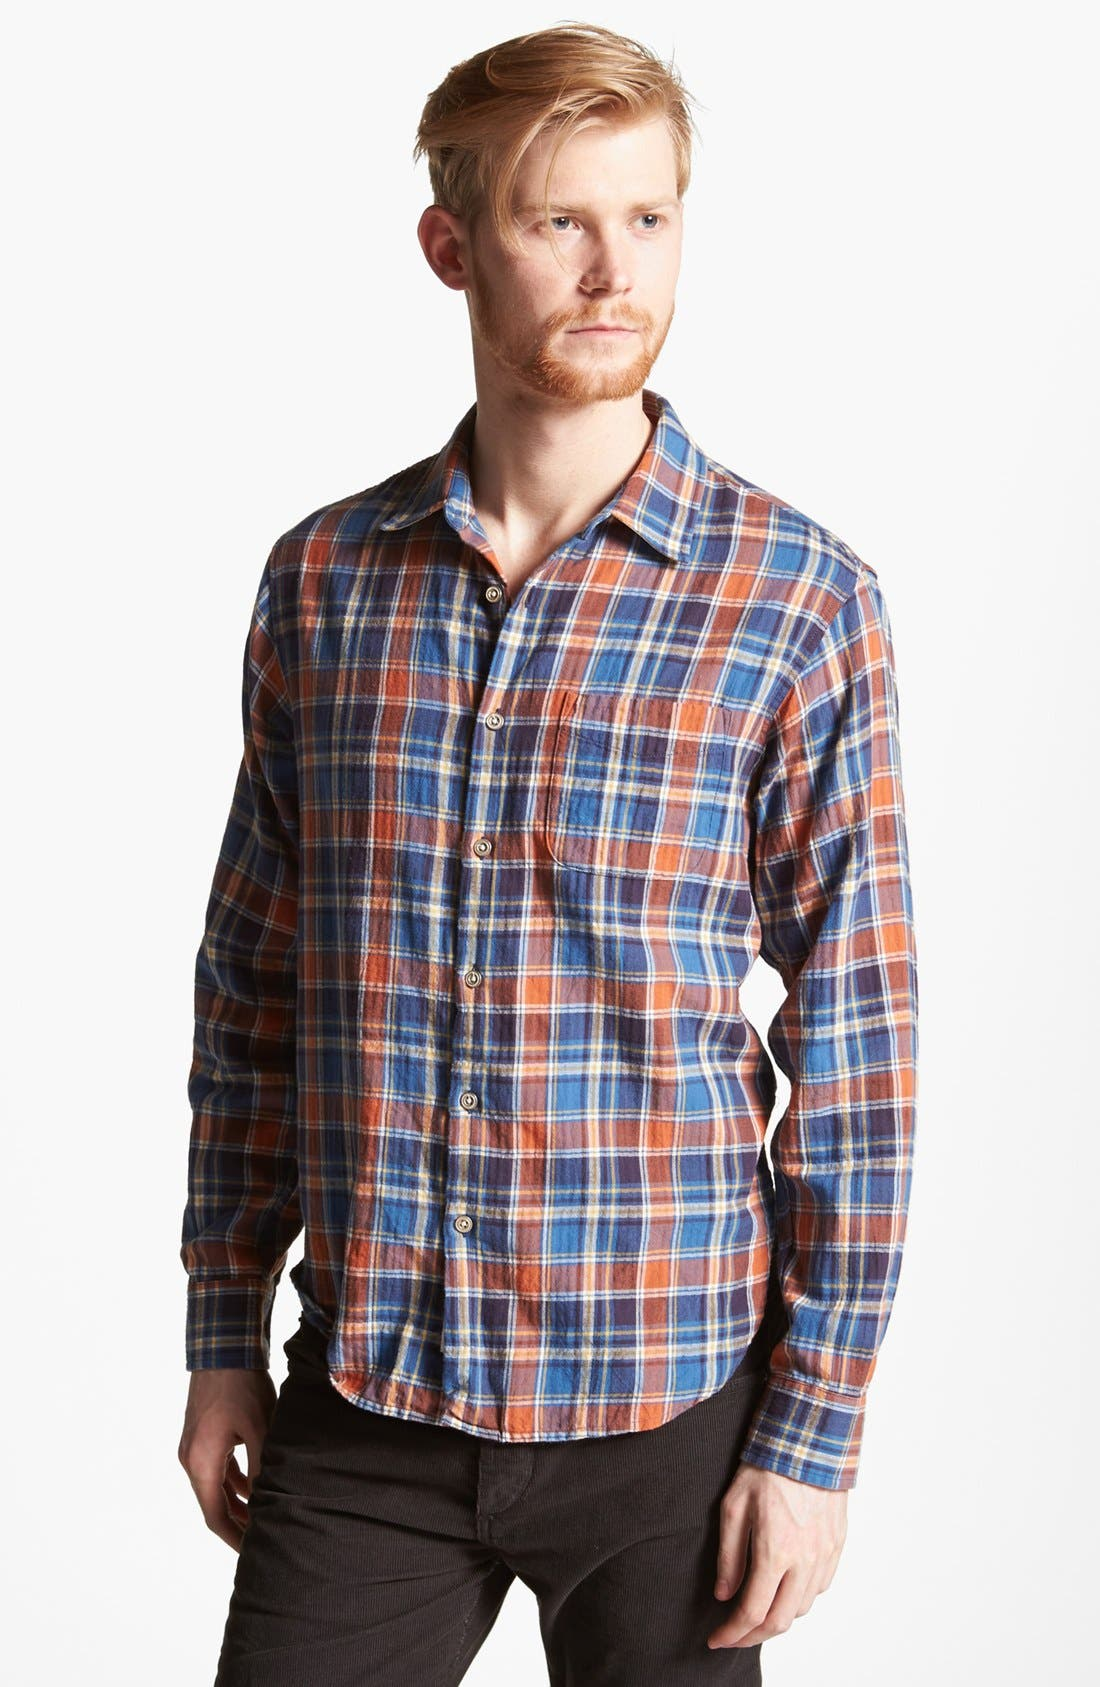 Main Image - rag & bone 'Beach' Herringbone Plaid Woven Shirt